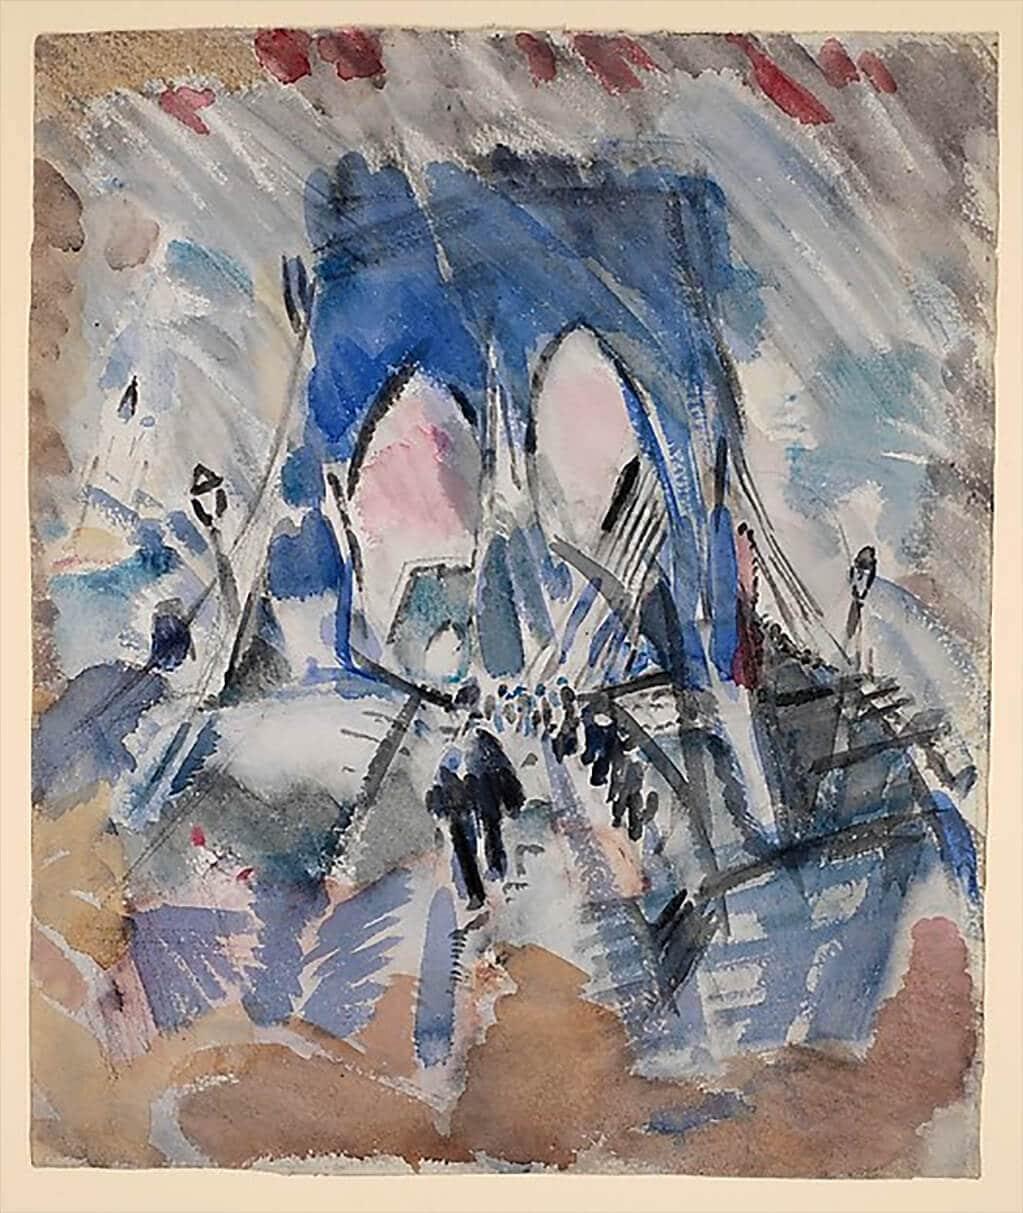 10 American Paintings Before Pollock Fisun G 252 Ner